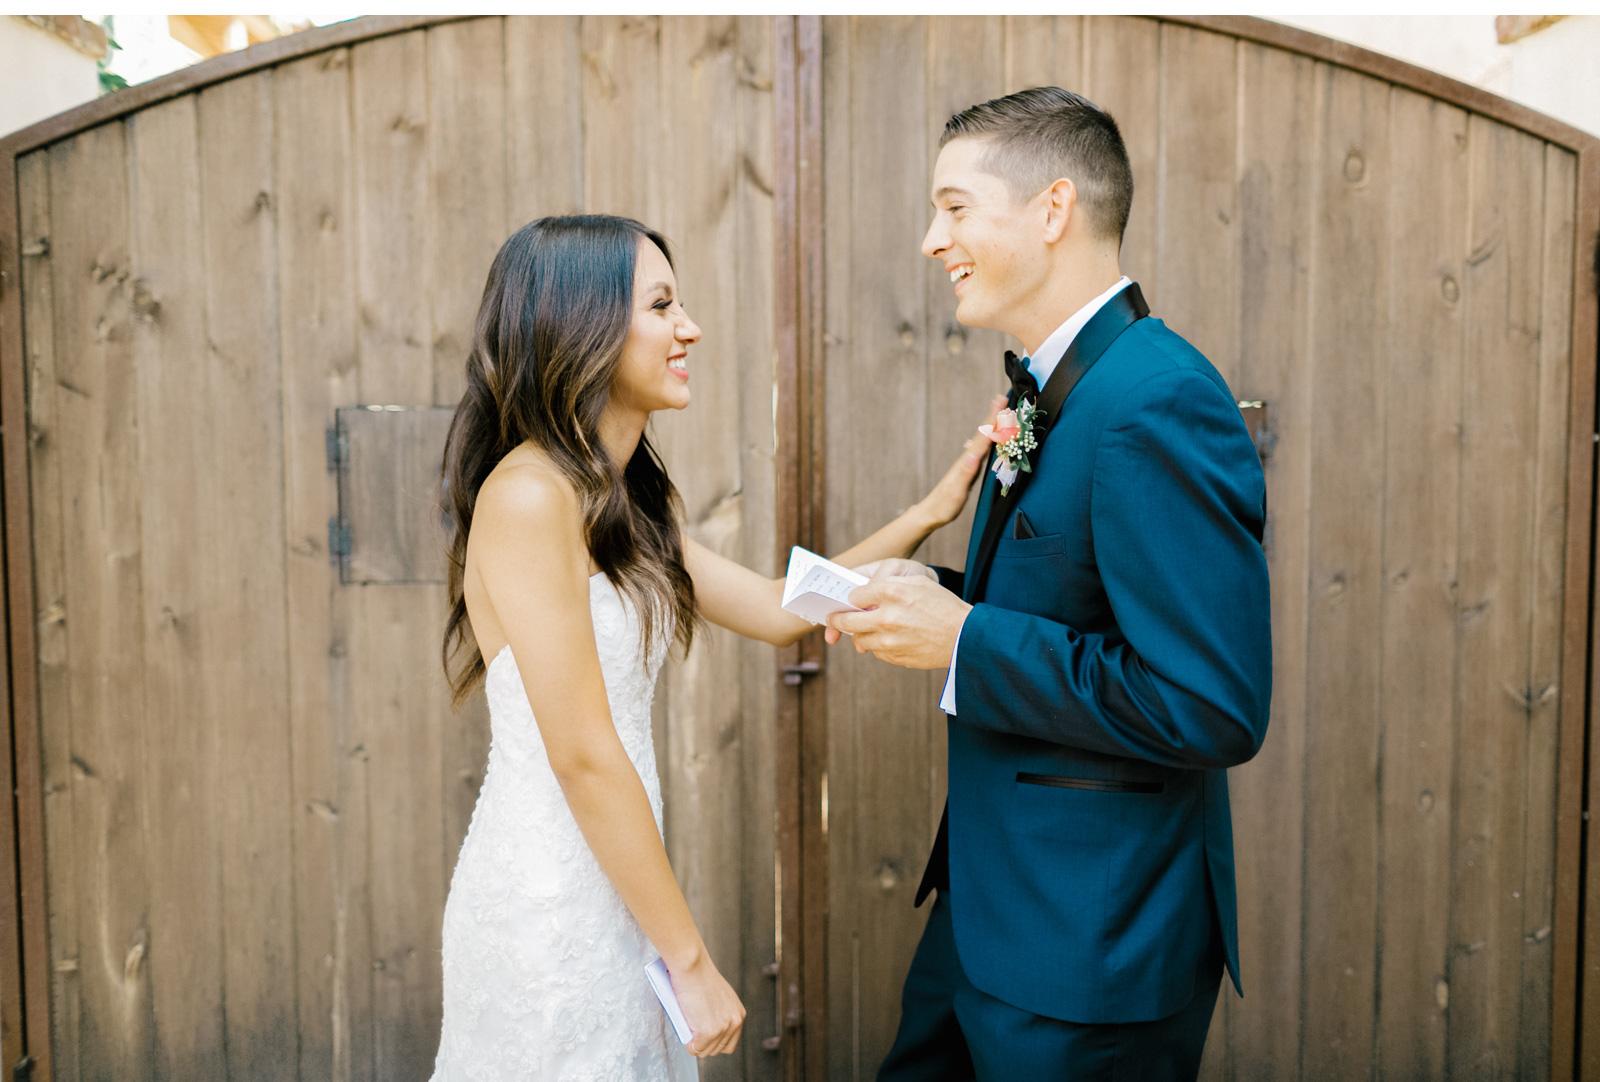 The-Villa-San-Juan-Capistrano-Wedding-Natalie-Schutt-Photography-Greylikes_03.jpg